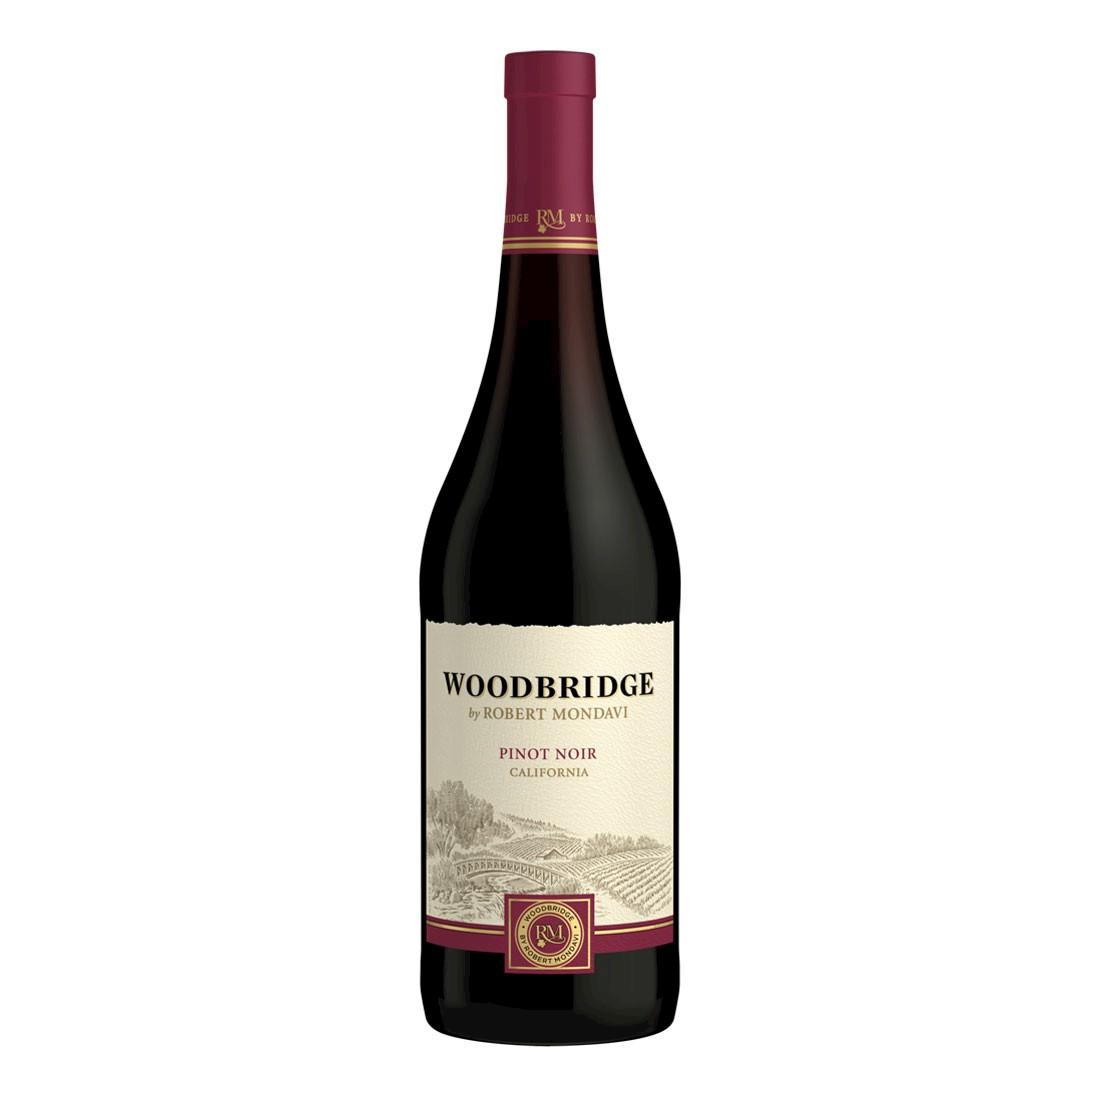 Vinho Woodbridge Robert Mondavi Pinot Noir 750 ml